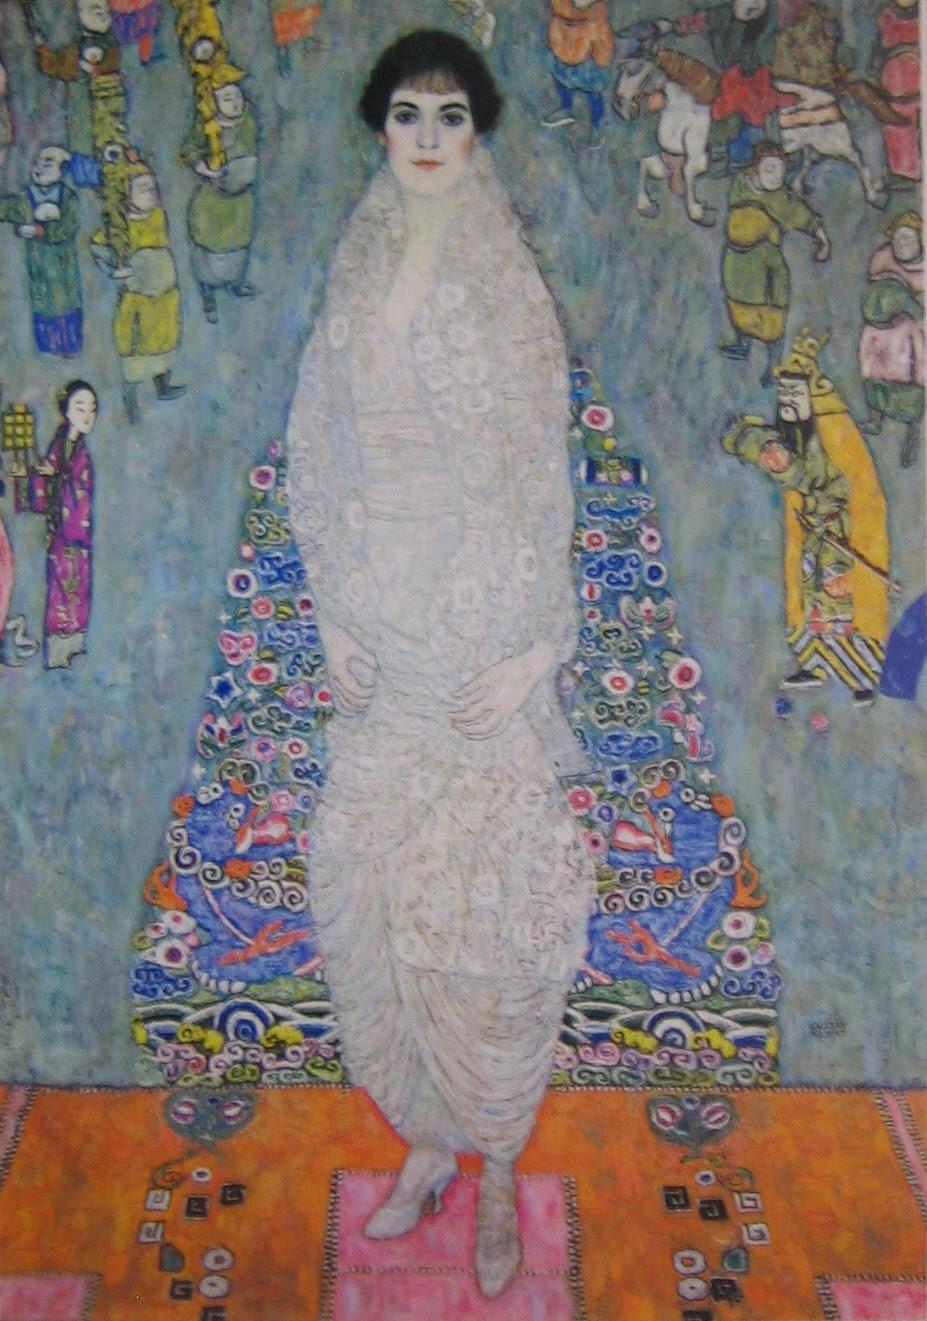 Bildnes Baronin Elisabeth Bachofen-Echt (Portrait of Baroness Elisabeth Bachofen-Echt), Gustav Klimt, c. 1914